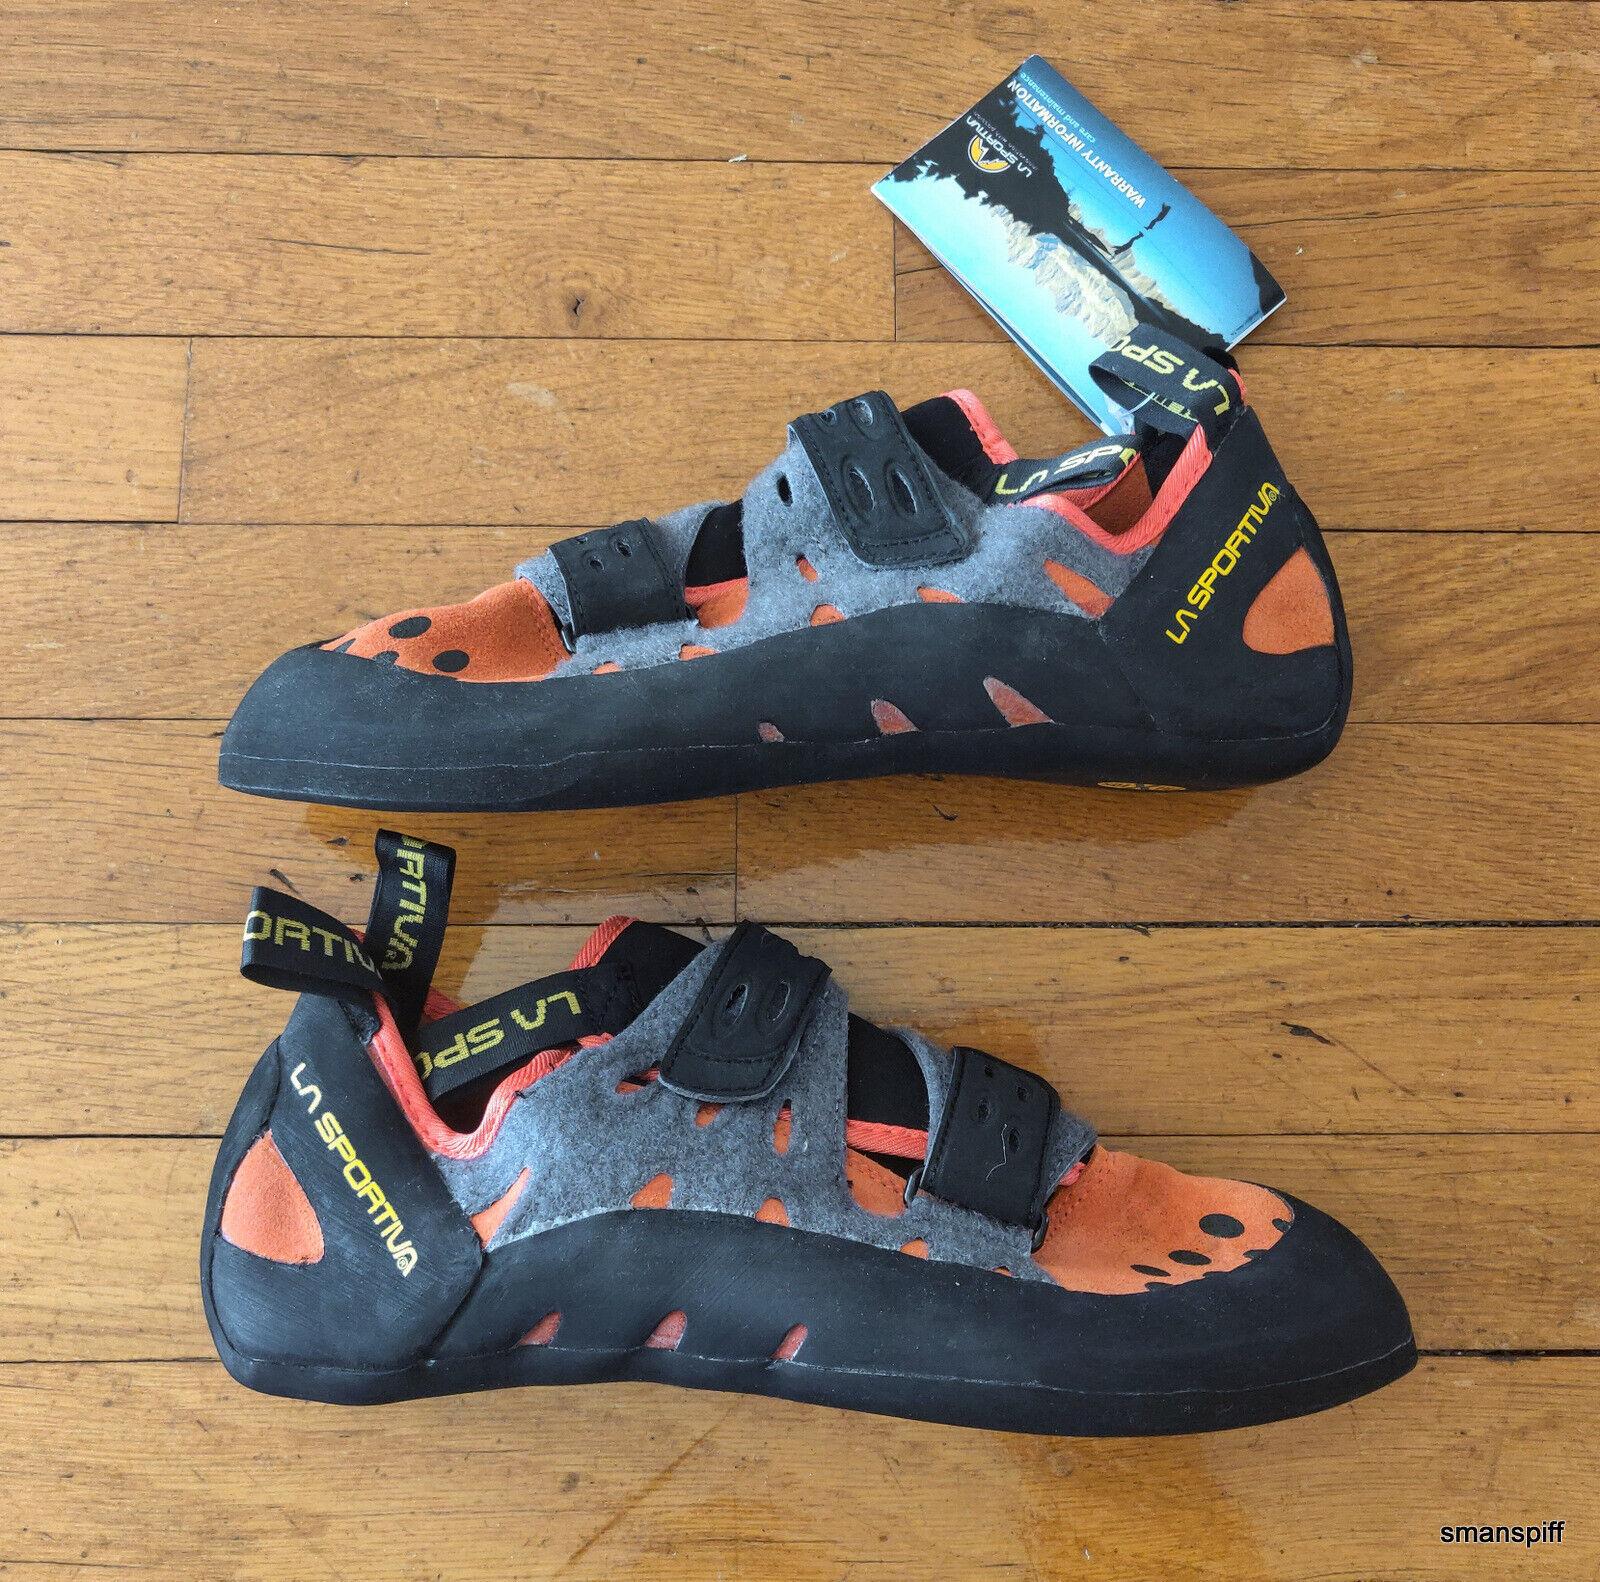 La Sportiva Men's Tarantula FriXion Velcro Beginner Climbing  shoes Flame US 11.5  online fashion shopping